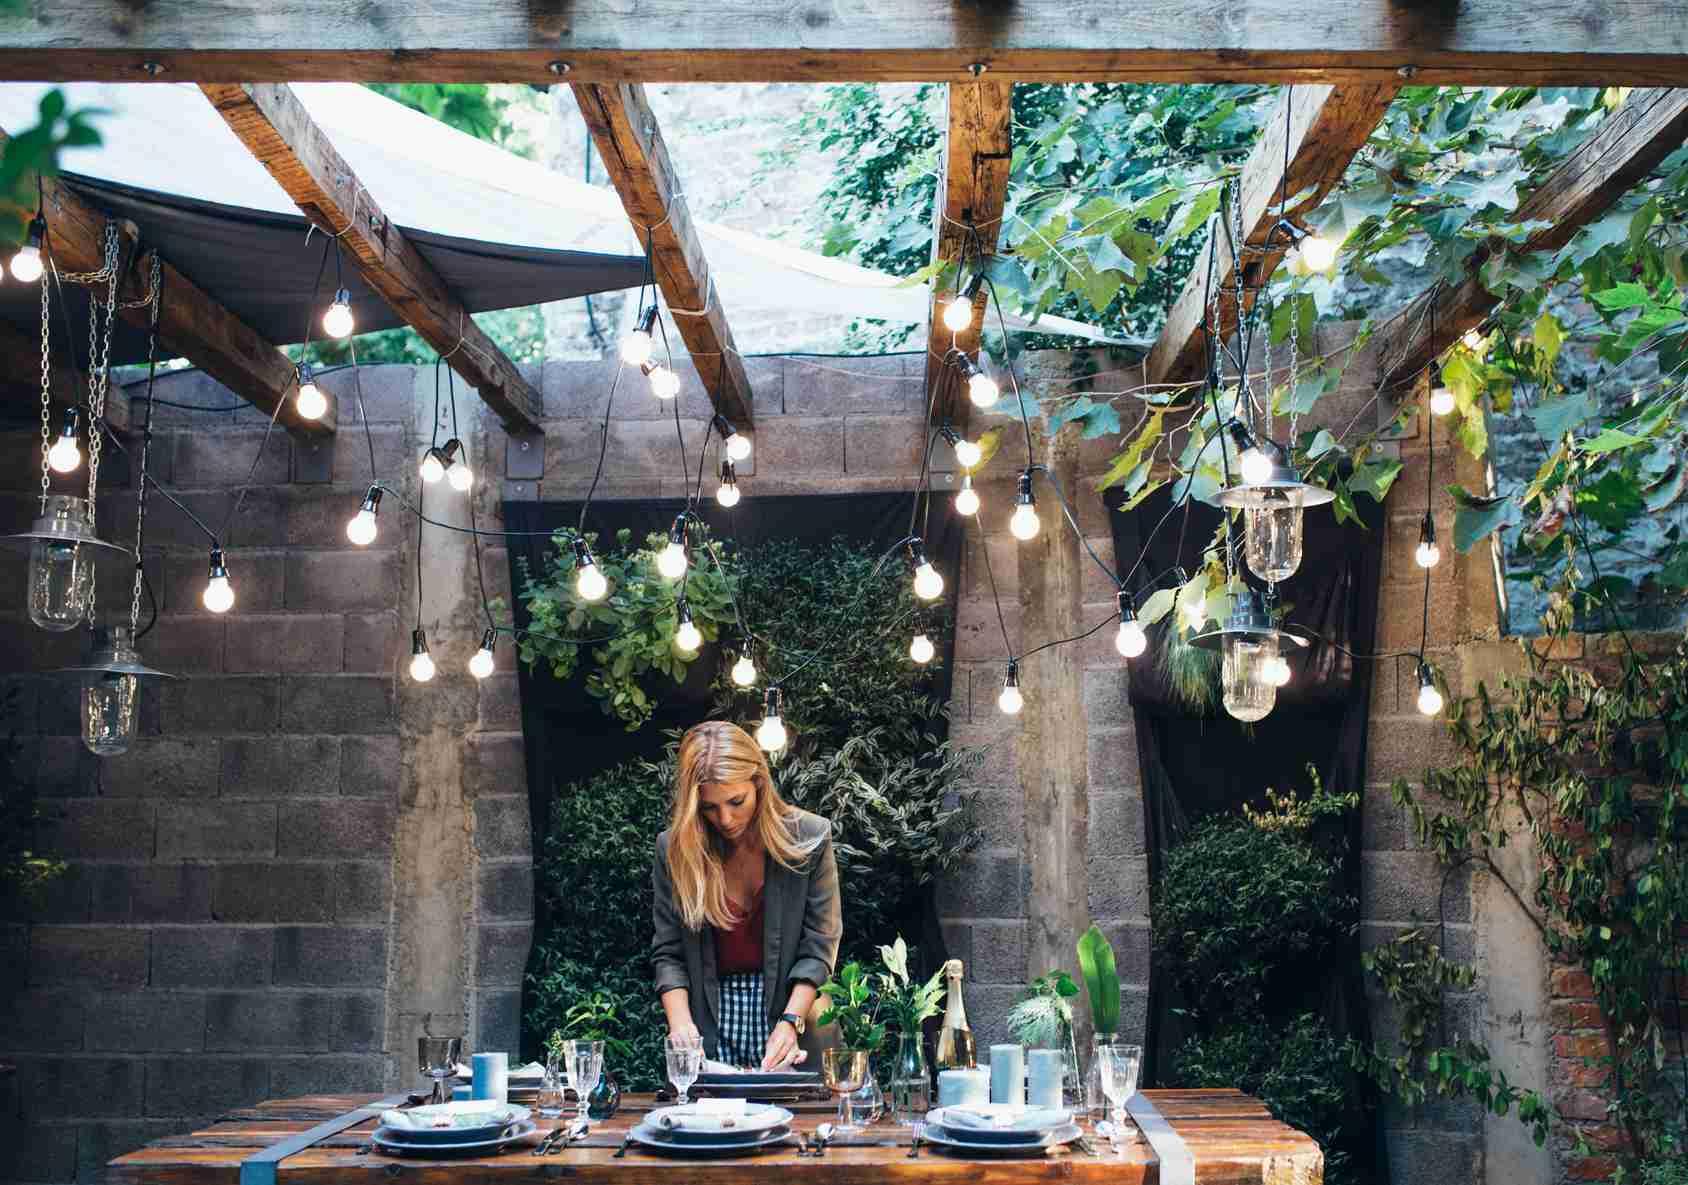 Backyard with hanging lights